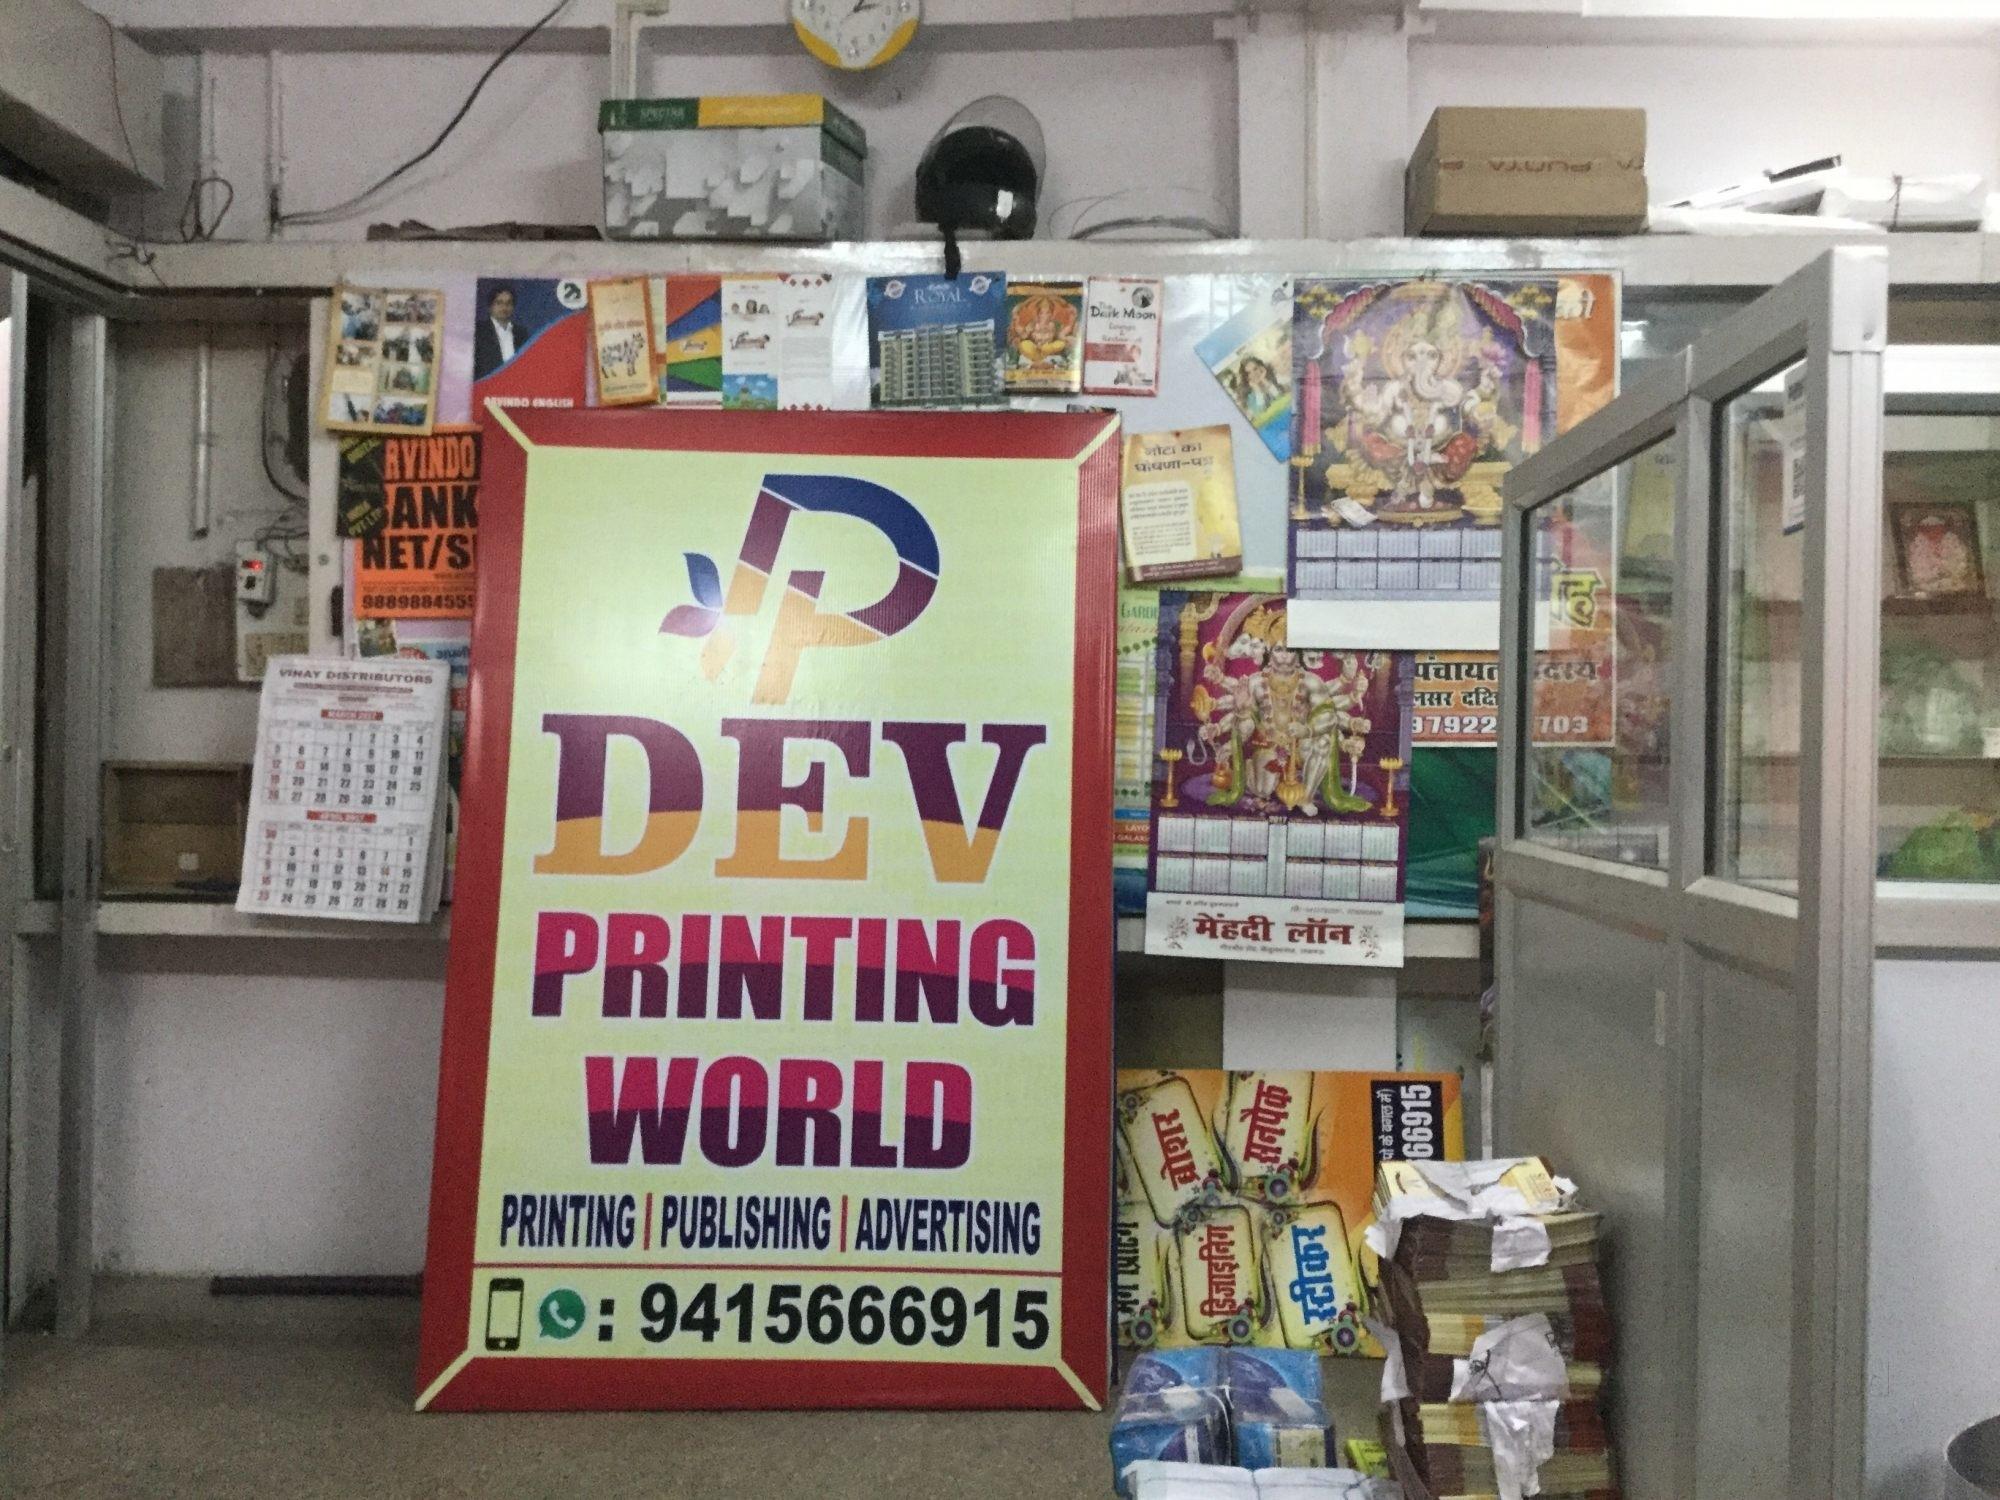 Top Calendar Printers In Mashak Ganj - Best Printers For Calendar Calendar Printing In Lucknow